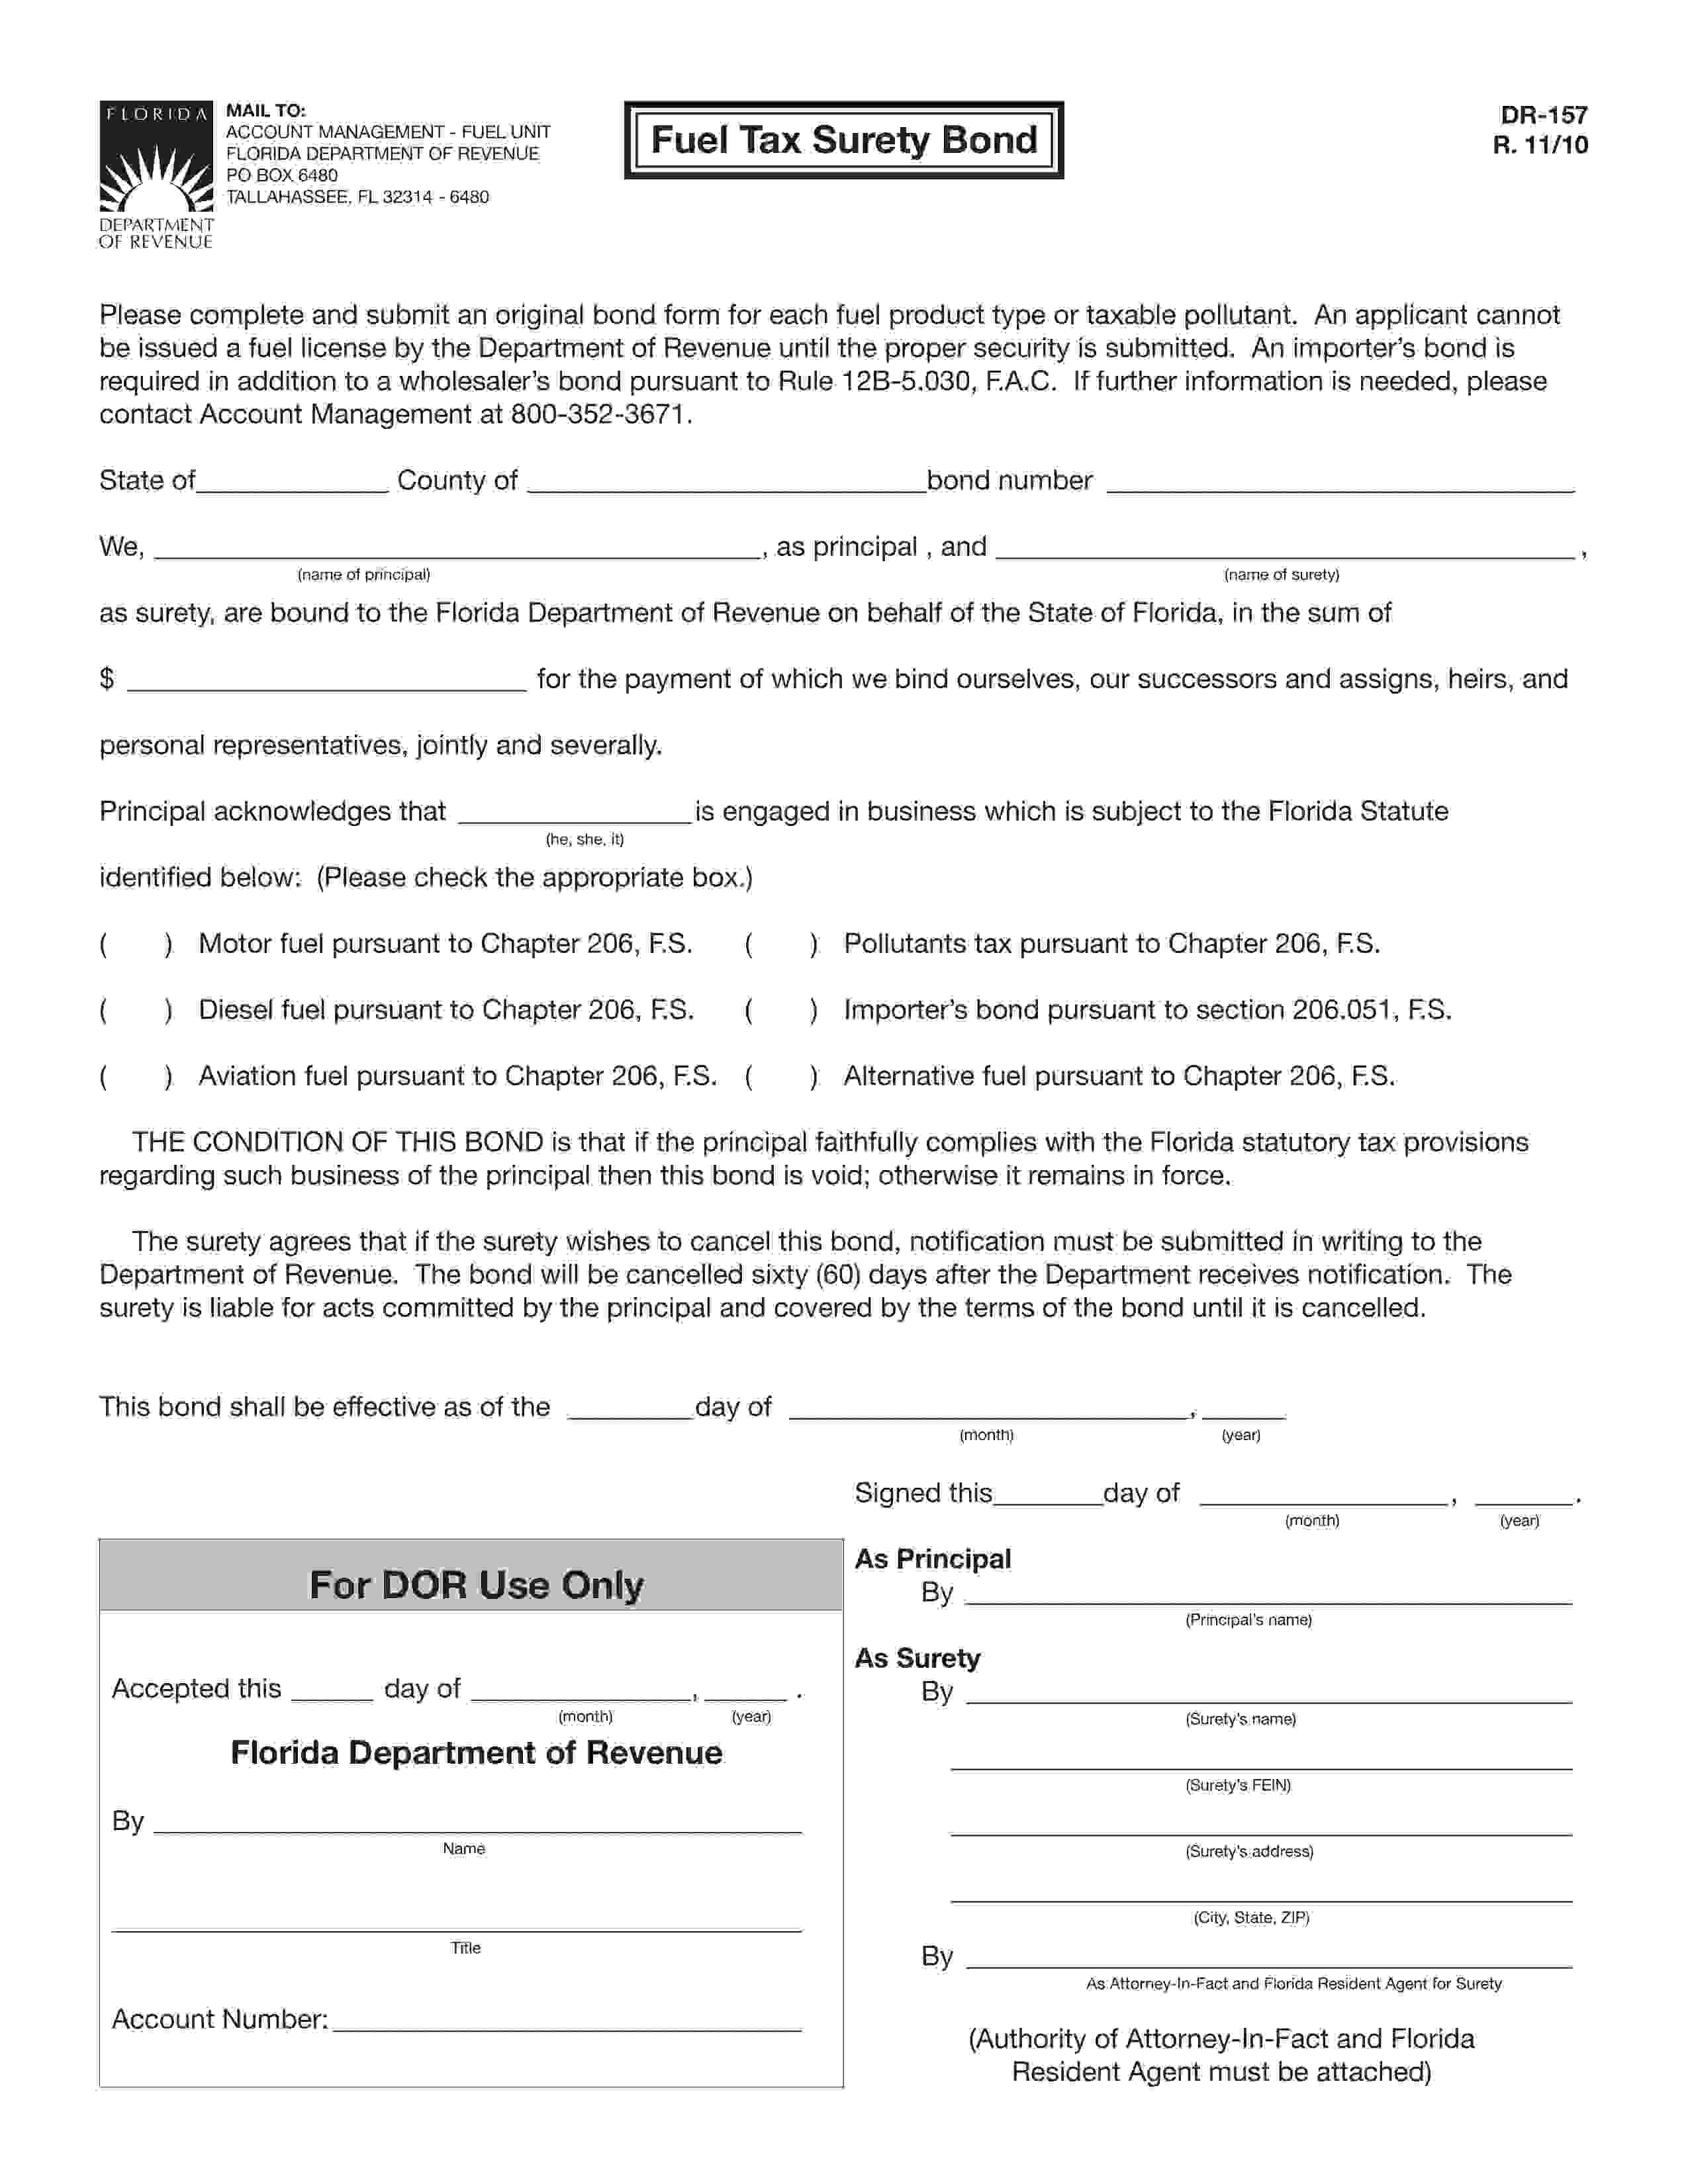 Florida Department Of Revenue, Fuel Unit Fuel Tax: Motor Fuel Bond sample image